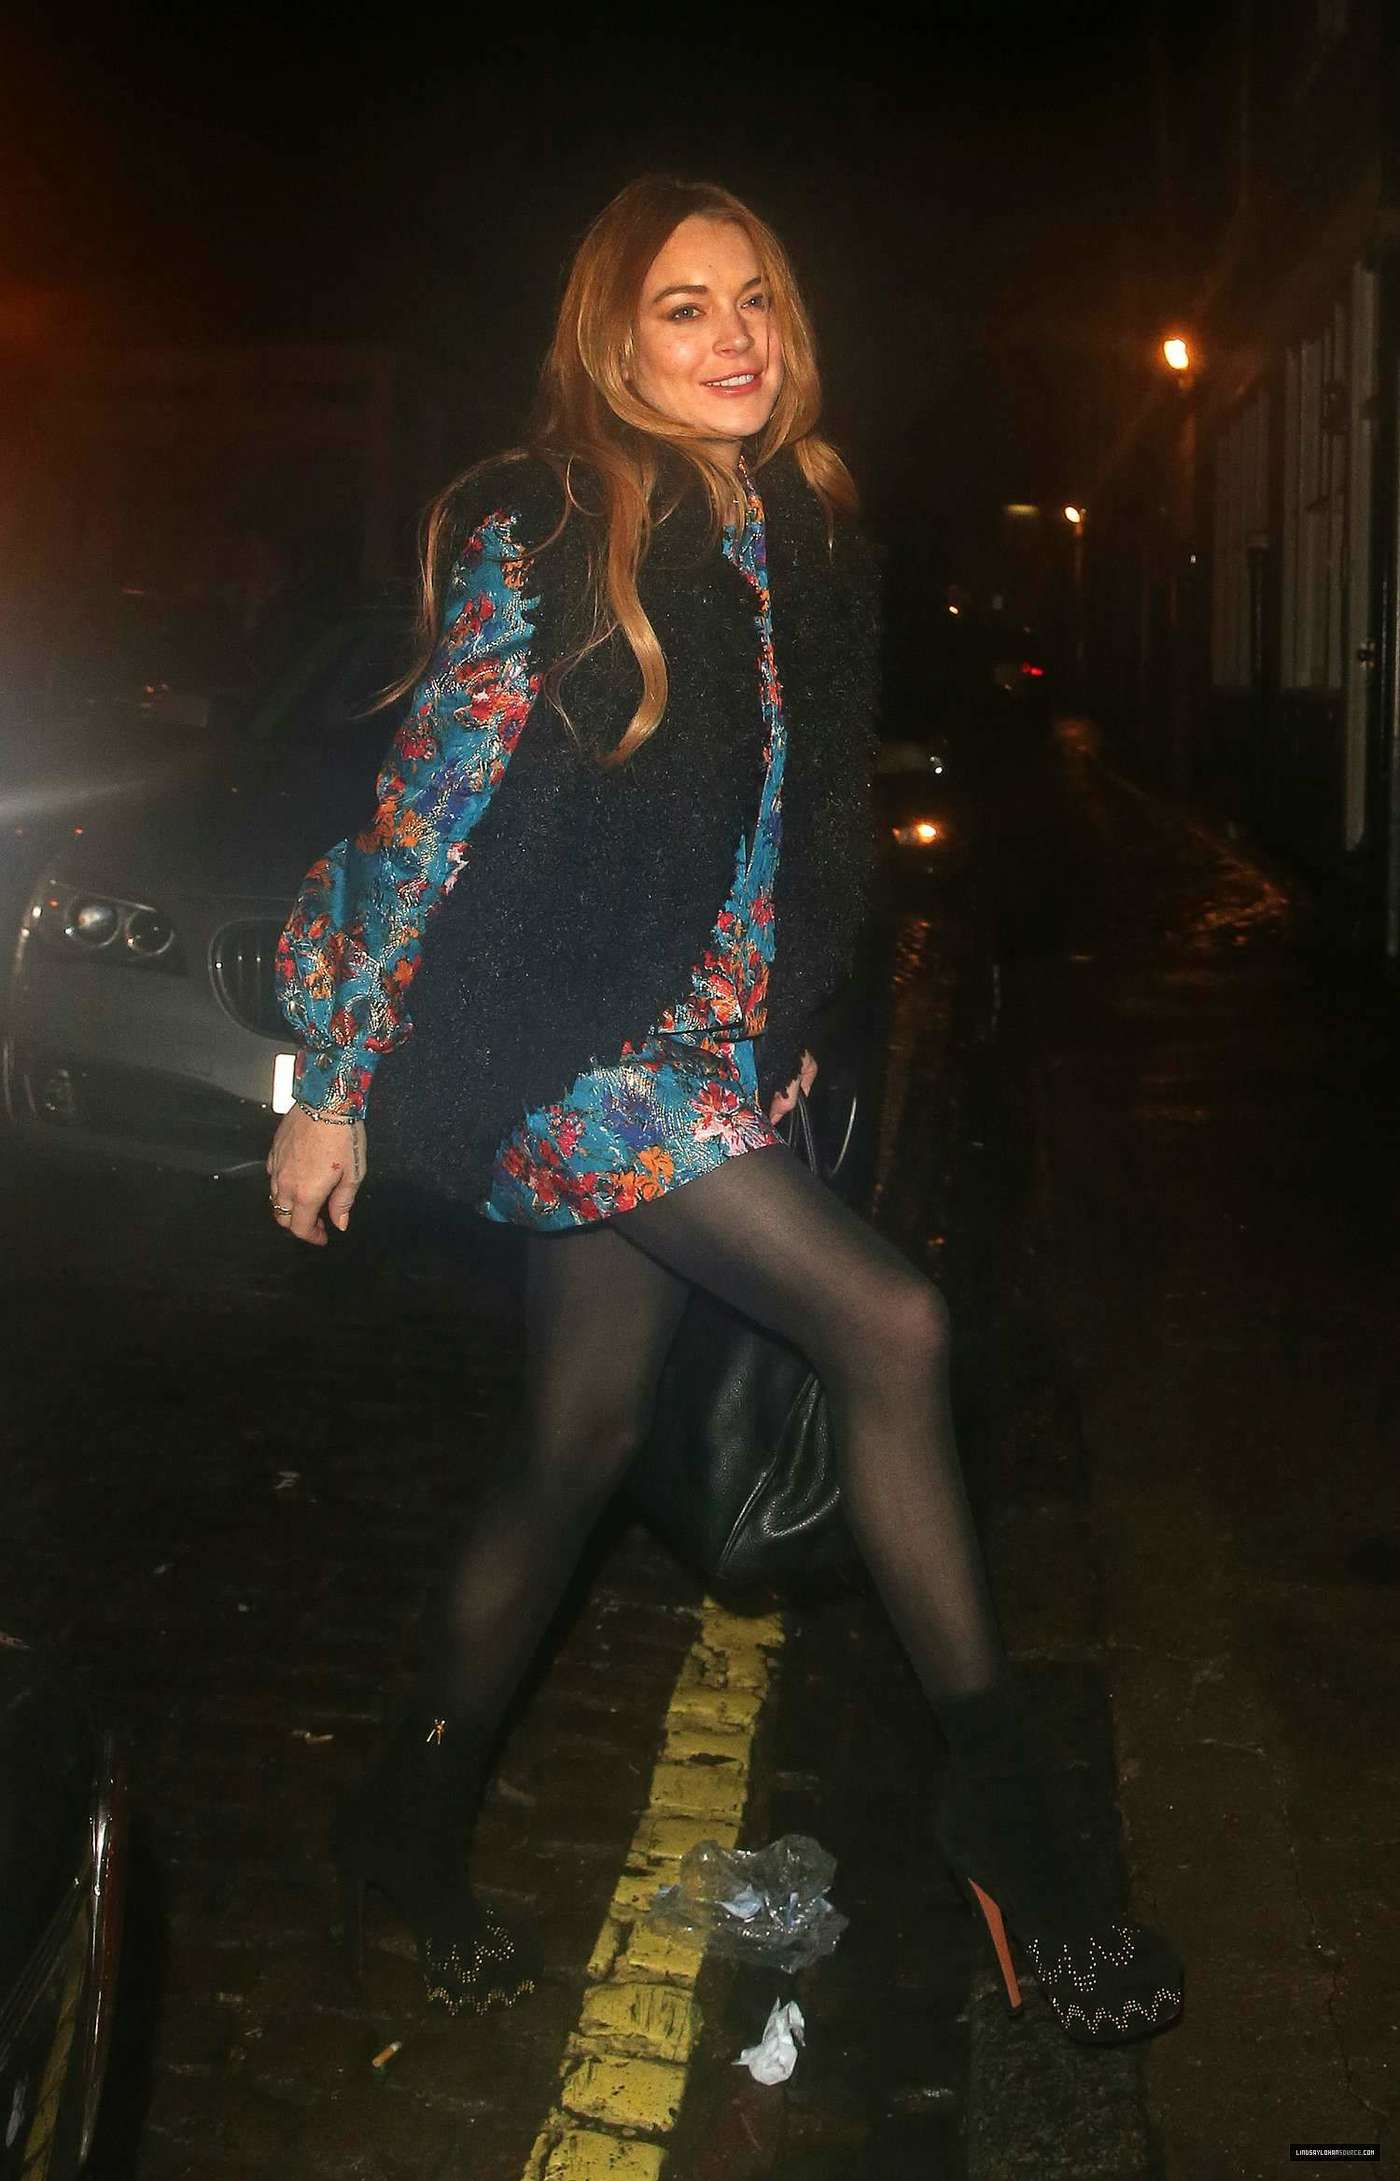 Lindsay Lohan 2014 : Lindsay Lohan in Mini Dress Leaves the Chiltern Firehouse -14